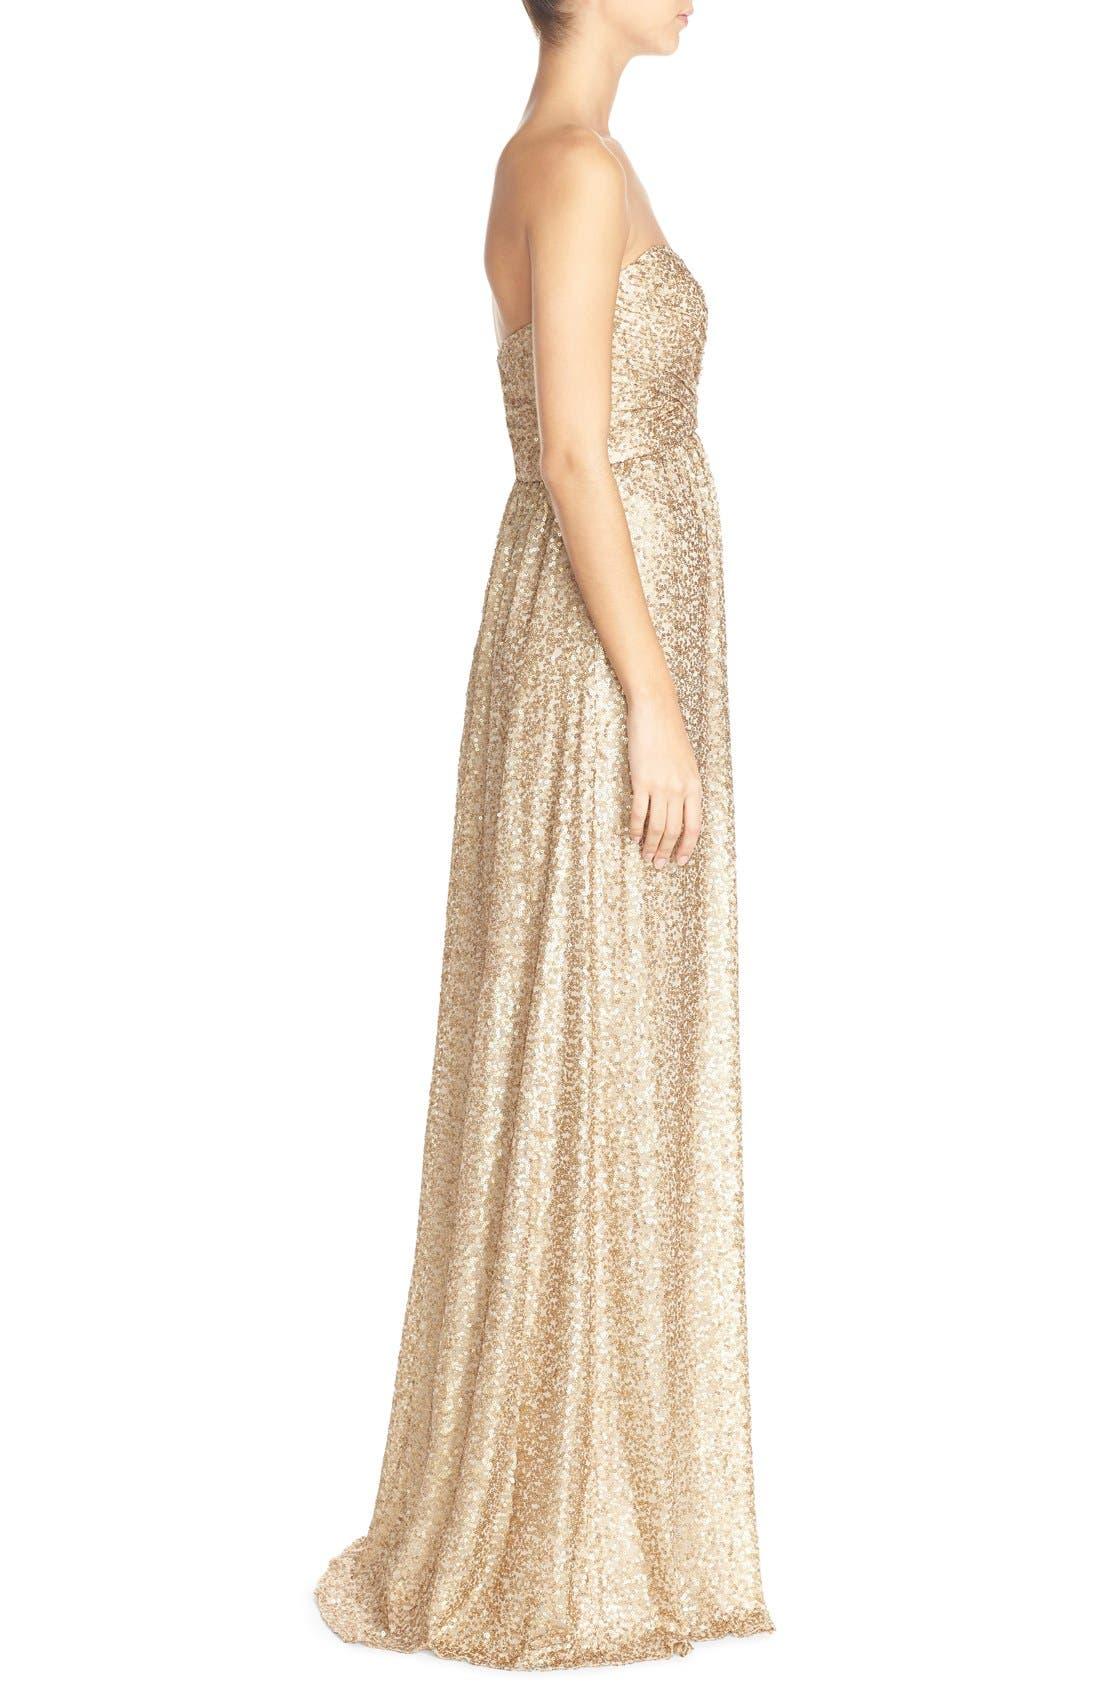 'London' Sequin Tulle Strapless Column Gown,                             Alternate thumbnail 3, color,                             710